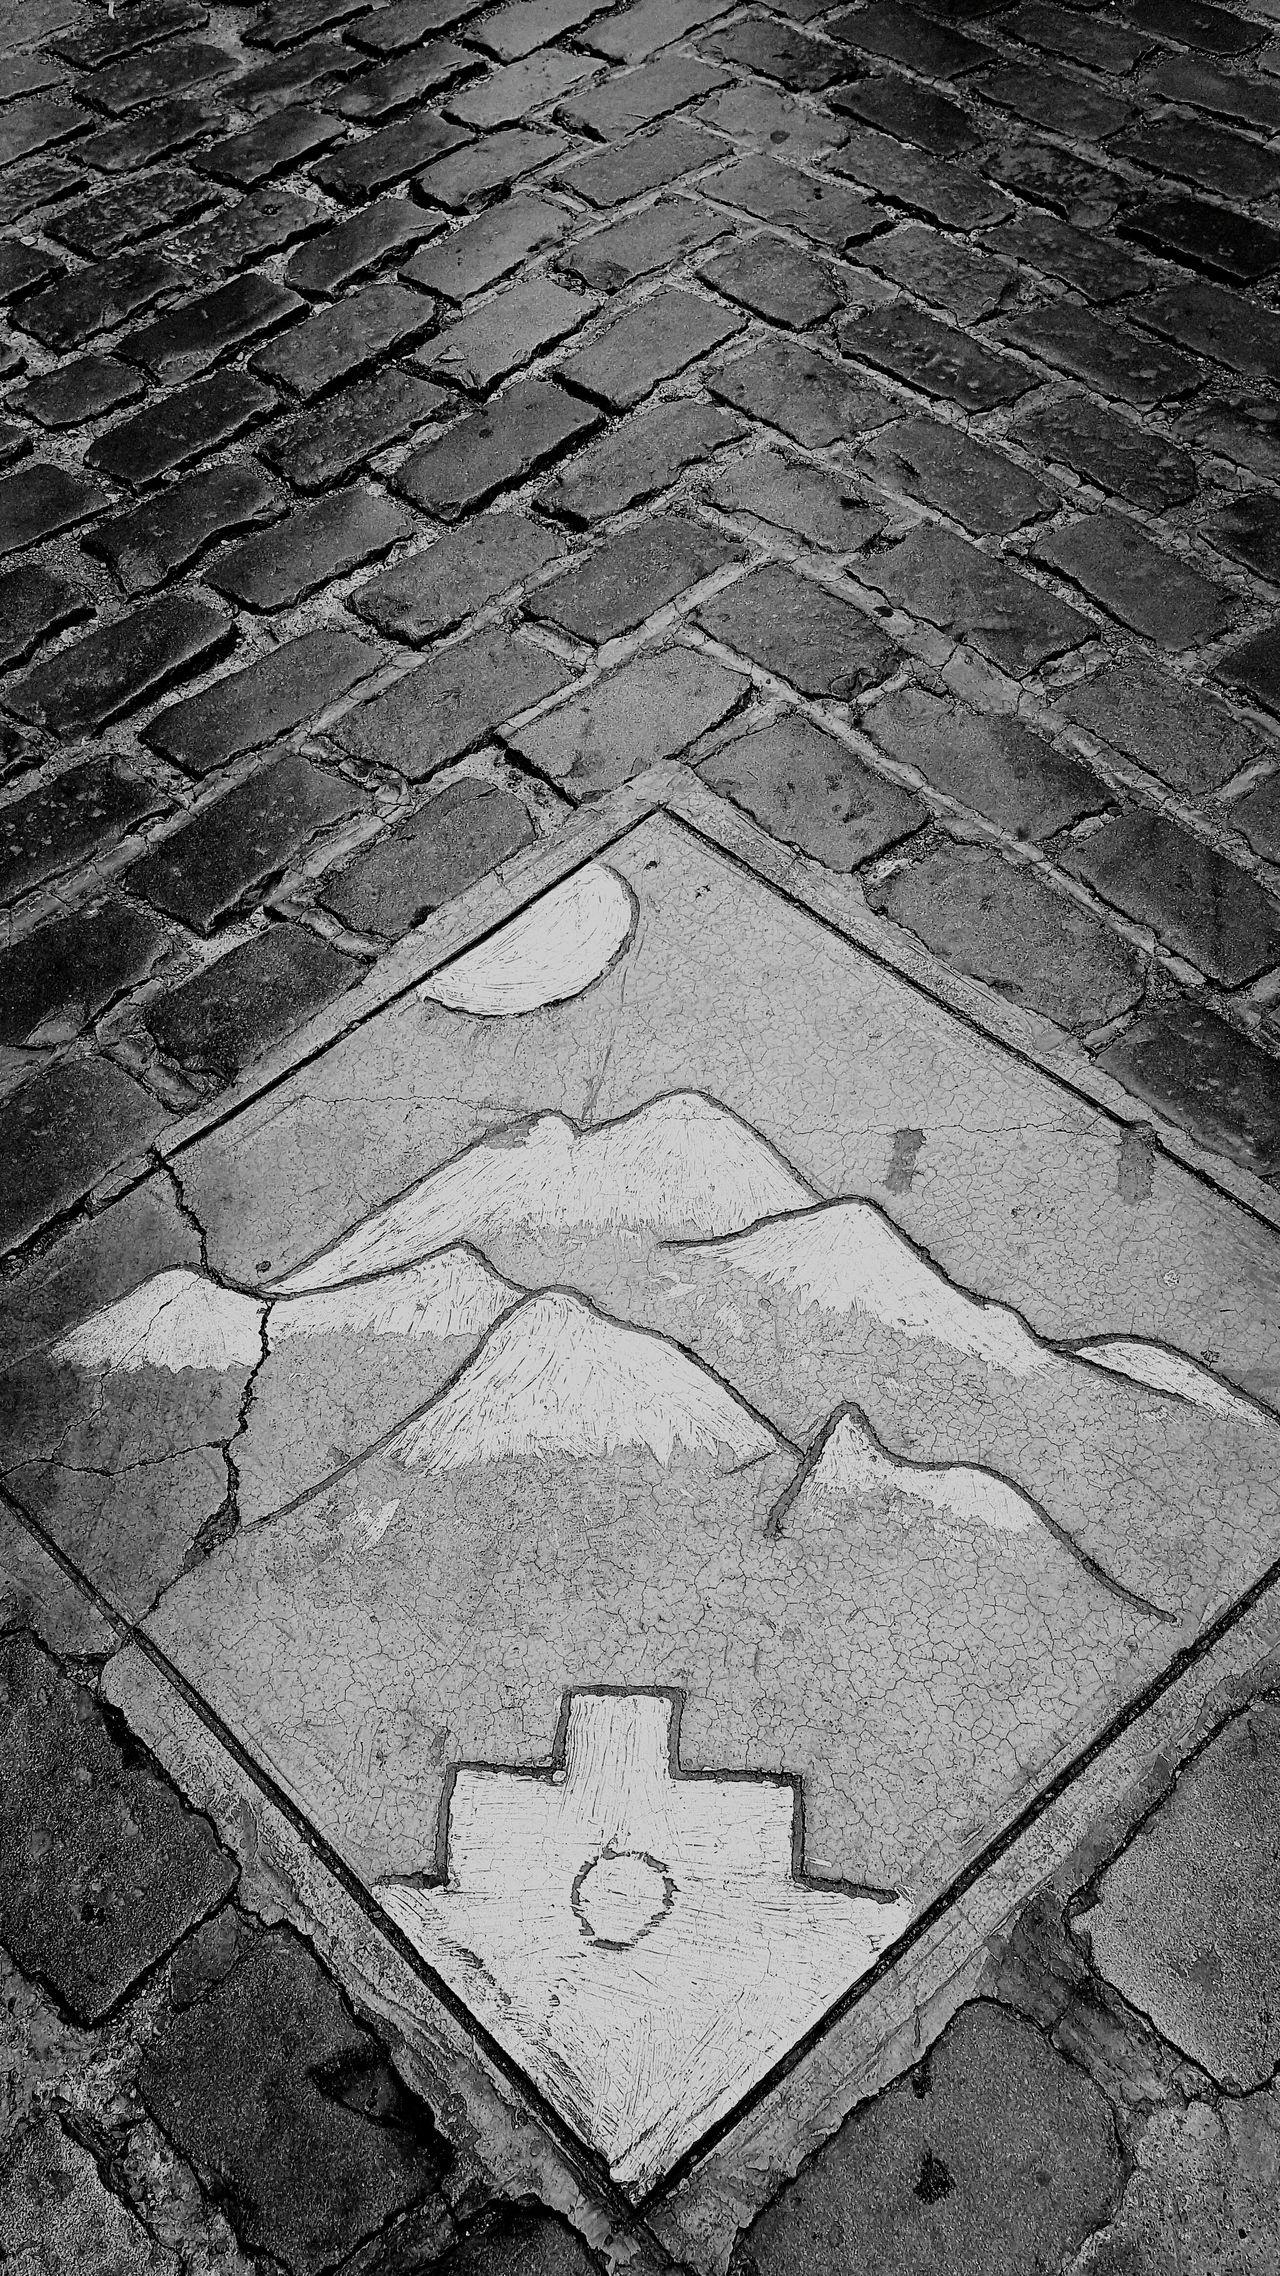 Road Close-up Street Photography Polished Surface Polished Brick Road Road Cobblestone Pattern Drain Streetart Black And White Photography Blackandwhite Photography